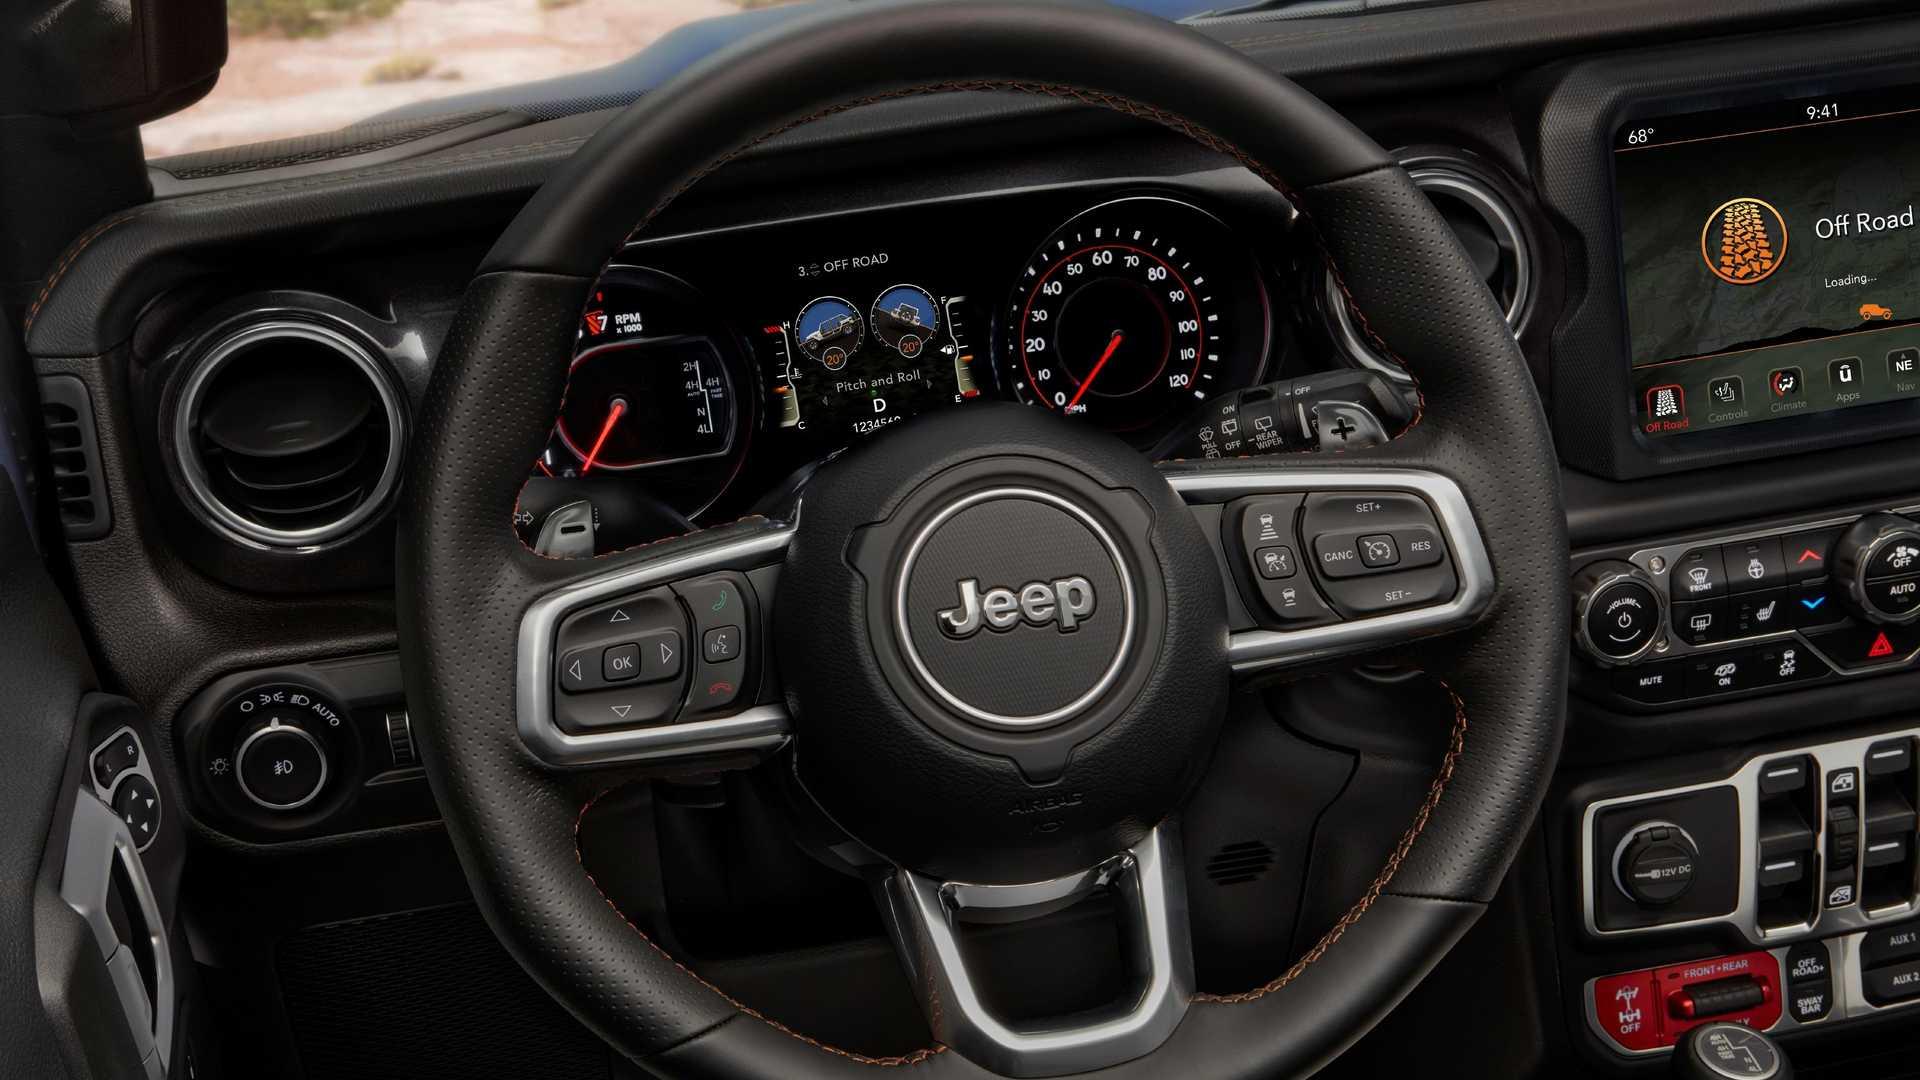 2021-jeep-wrangler-rubicon-392-interior-steering-wheel